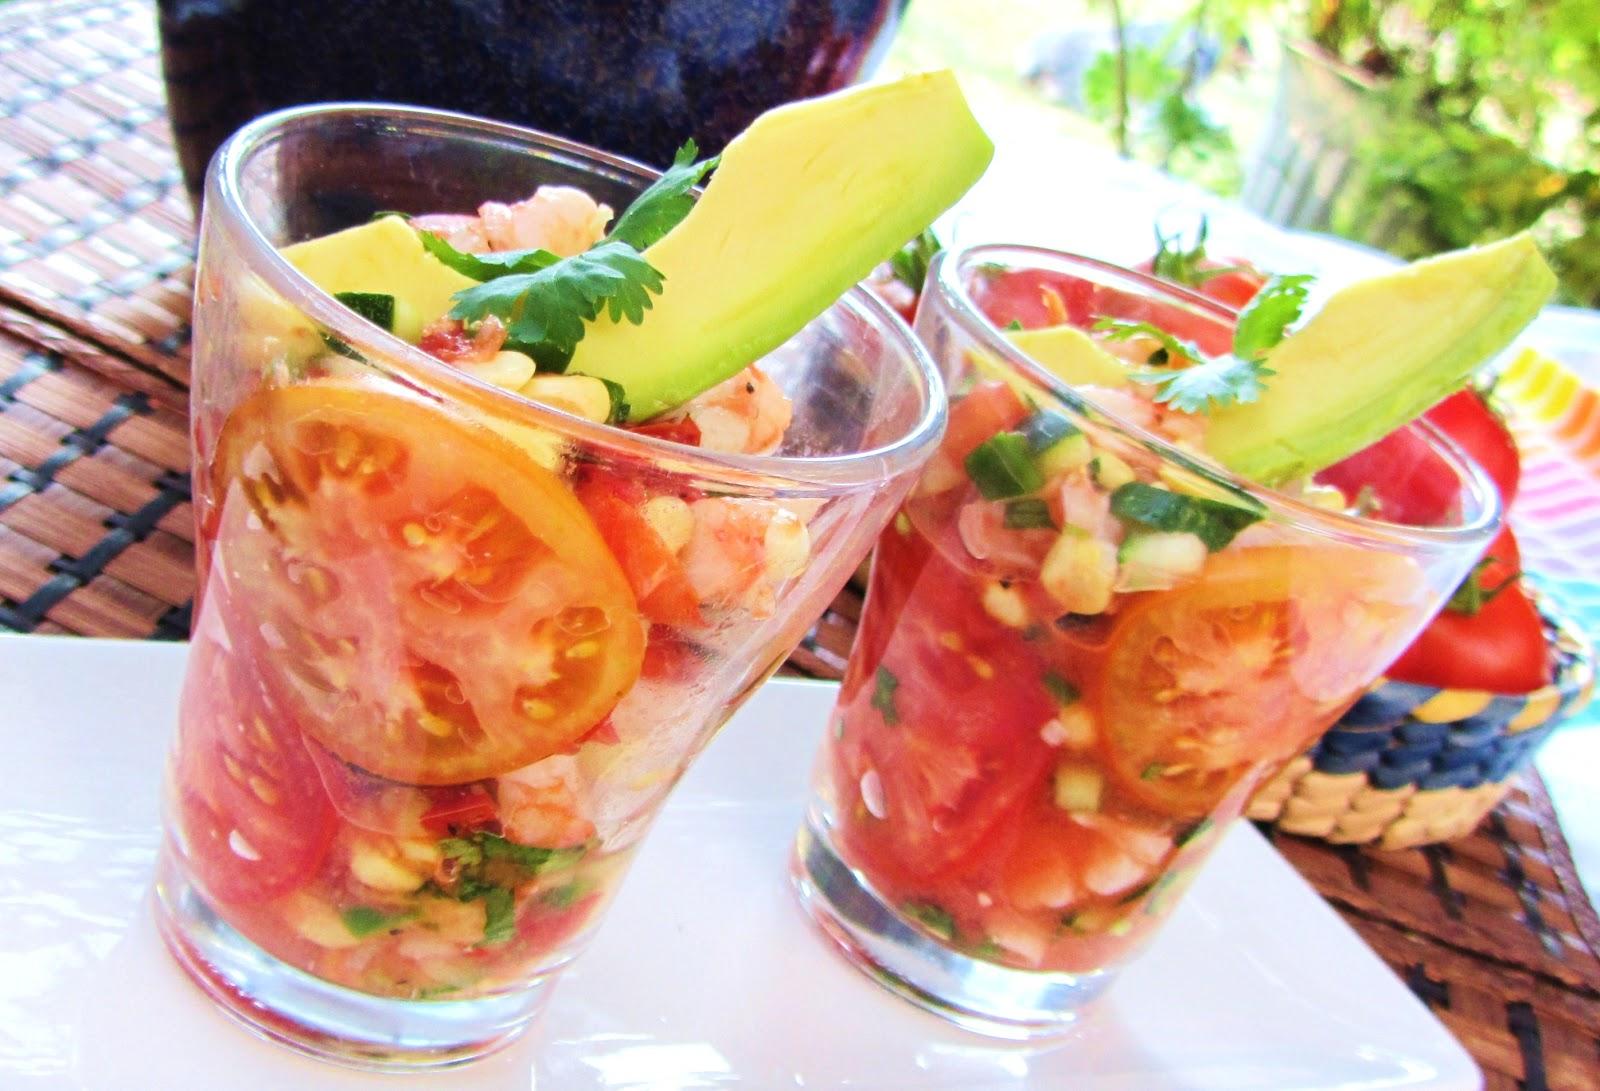 ... shrimp grilled gazpacho salad grilled jumbo shrimp and gazpacho shrimp